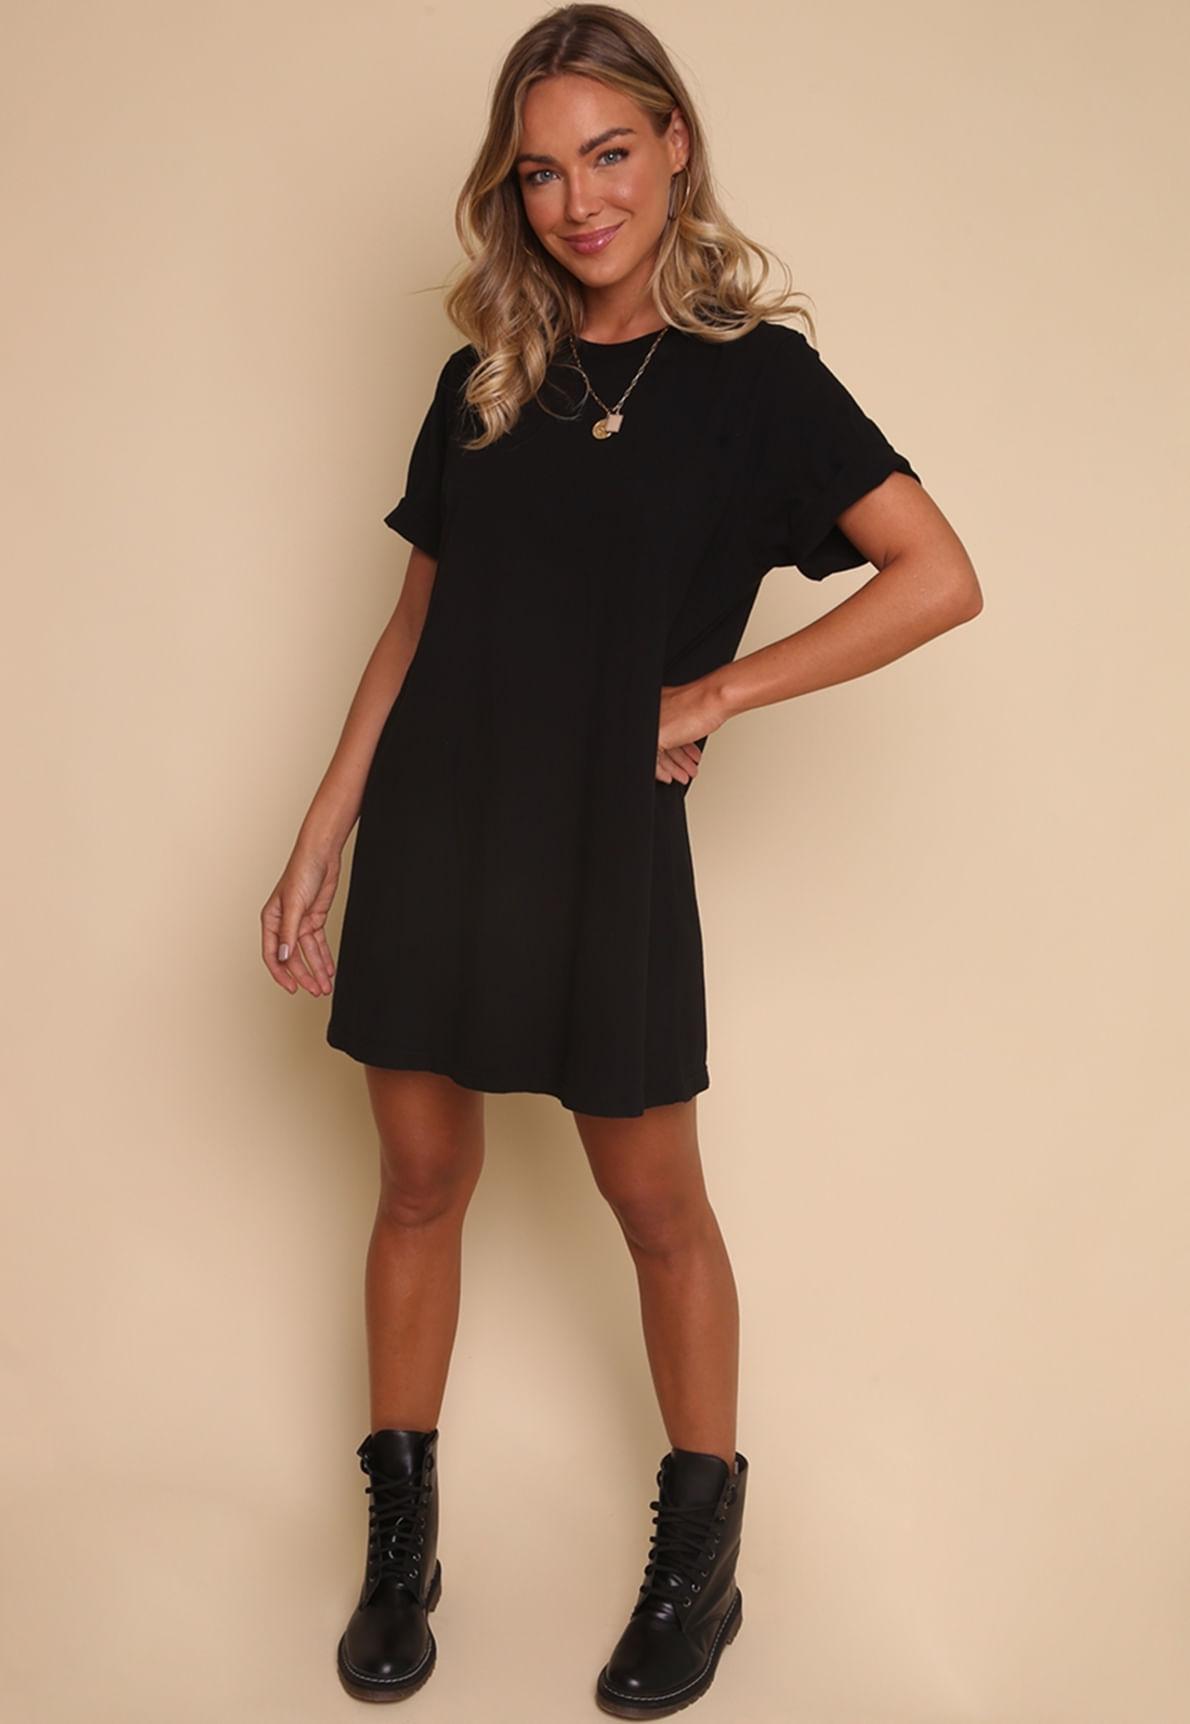 30104-vestido-camiset30104-vestido-camiseta-preto-california-days-mundo-lolita-01a-preto-california-days-mundo-lolita-01